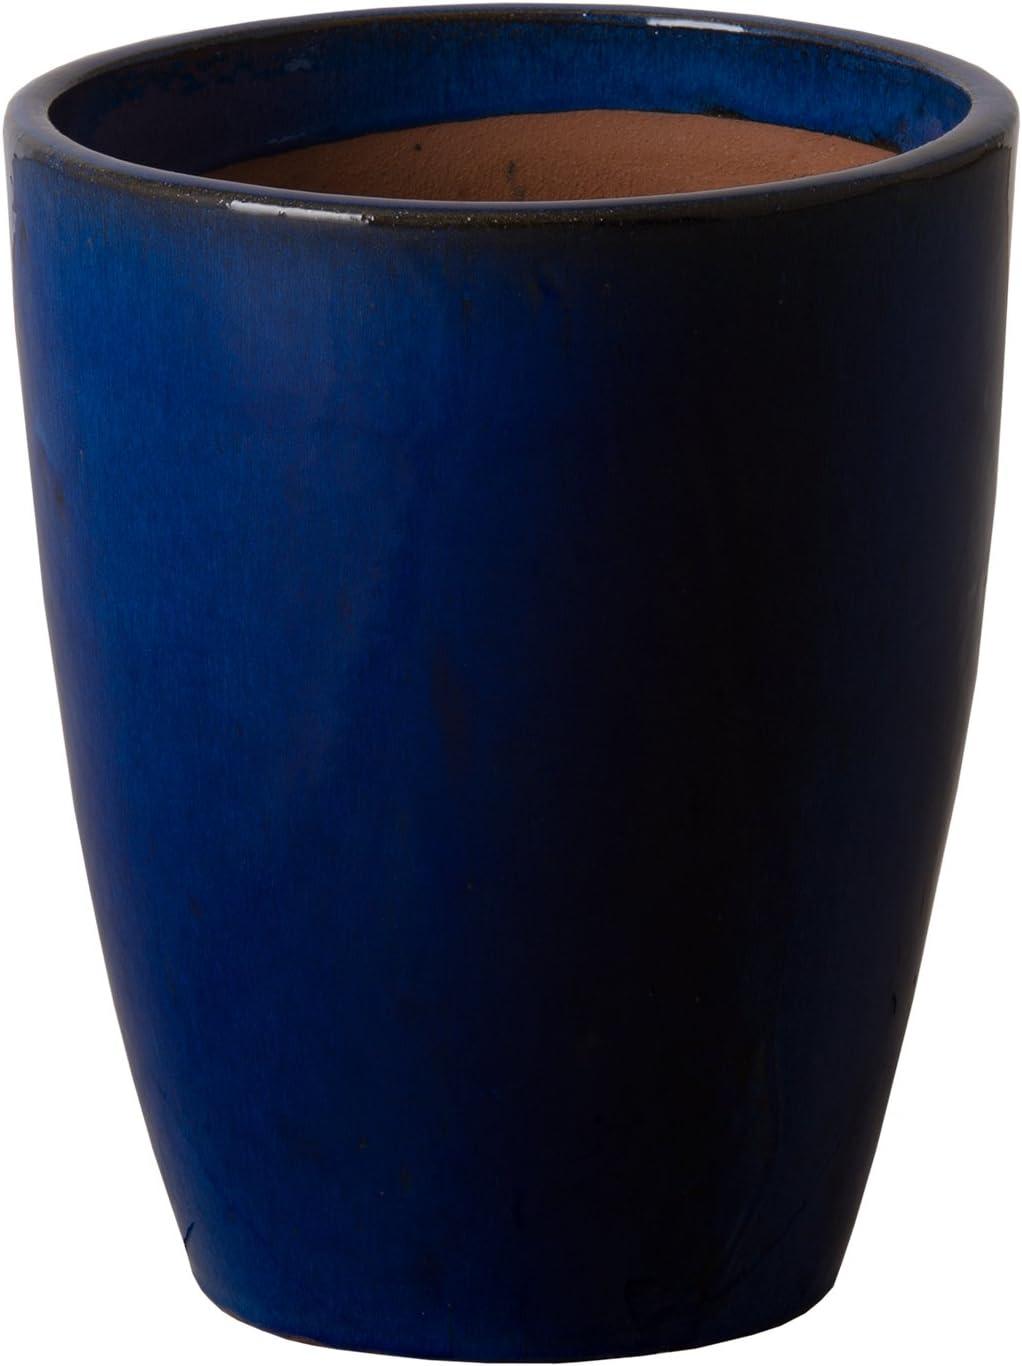 Emissary Home Garden Blue Bullet H Import Popular product Planter 14